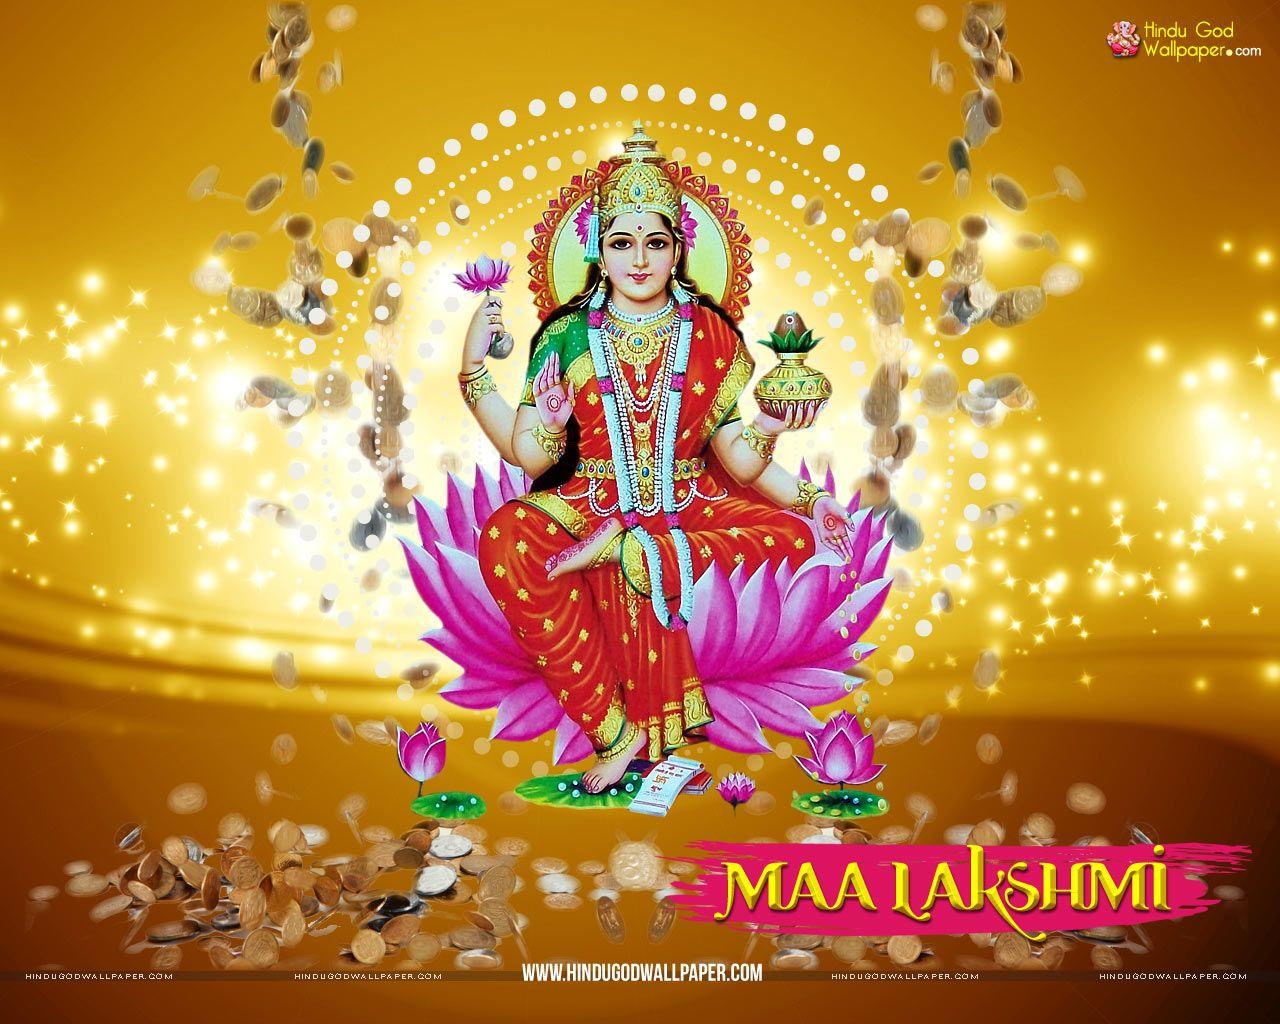 Wallpaper download karne wala apps - Maa Lakshmi Wallpaper Hd Full Size Free Download